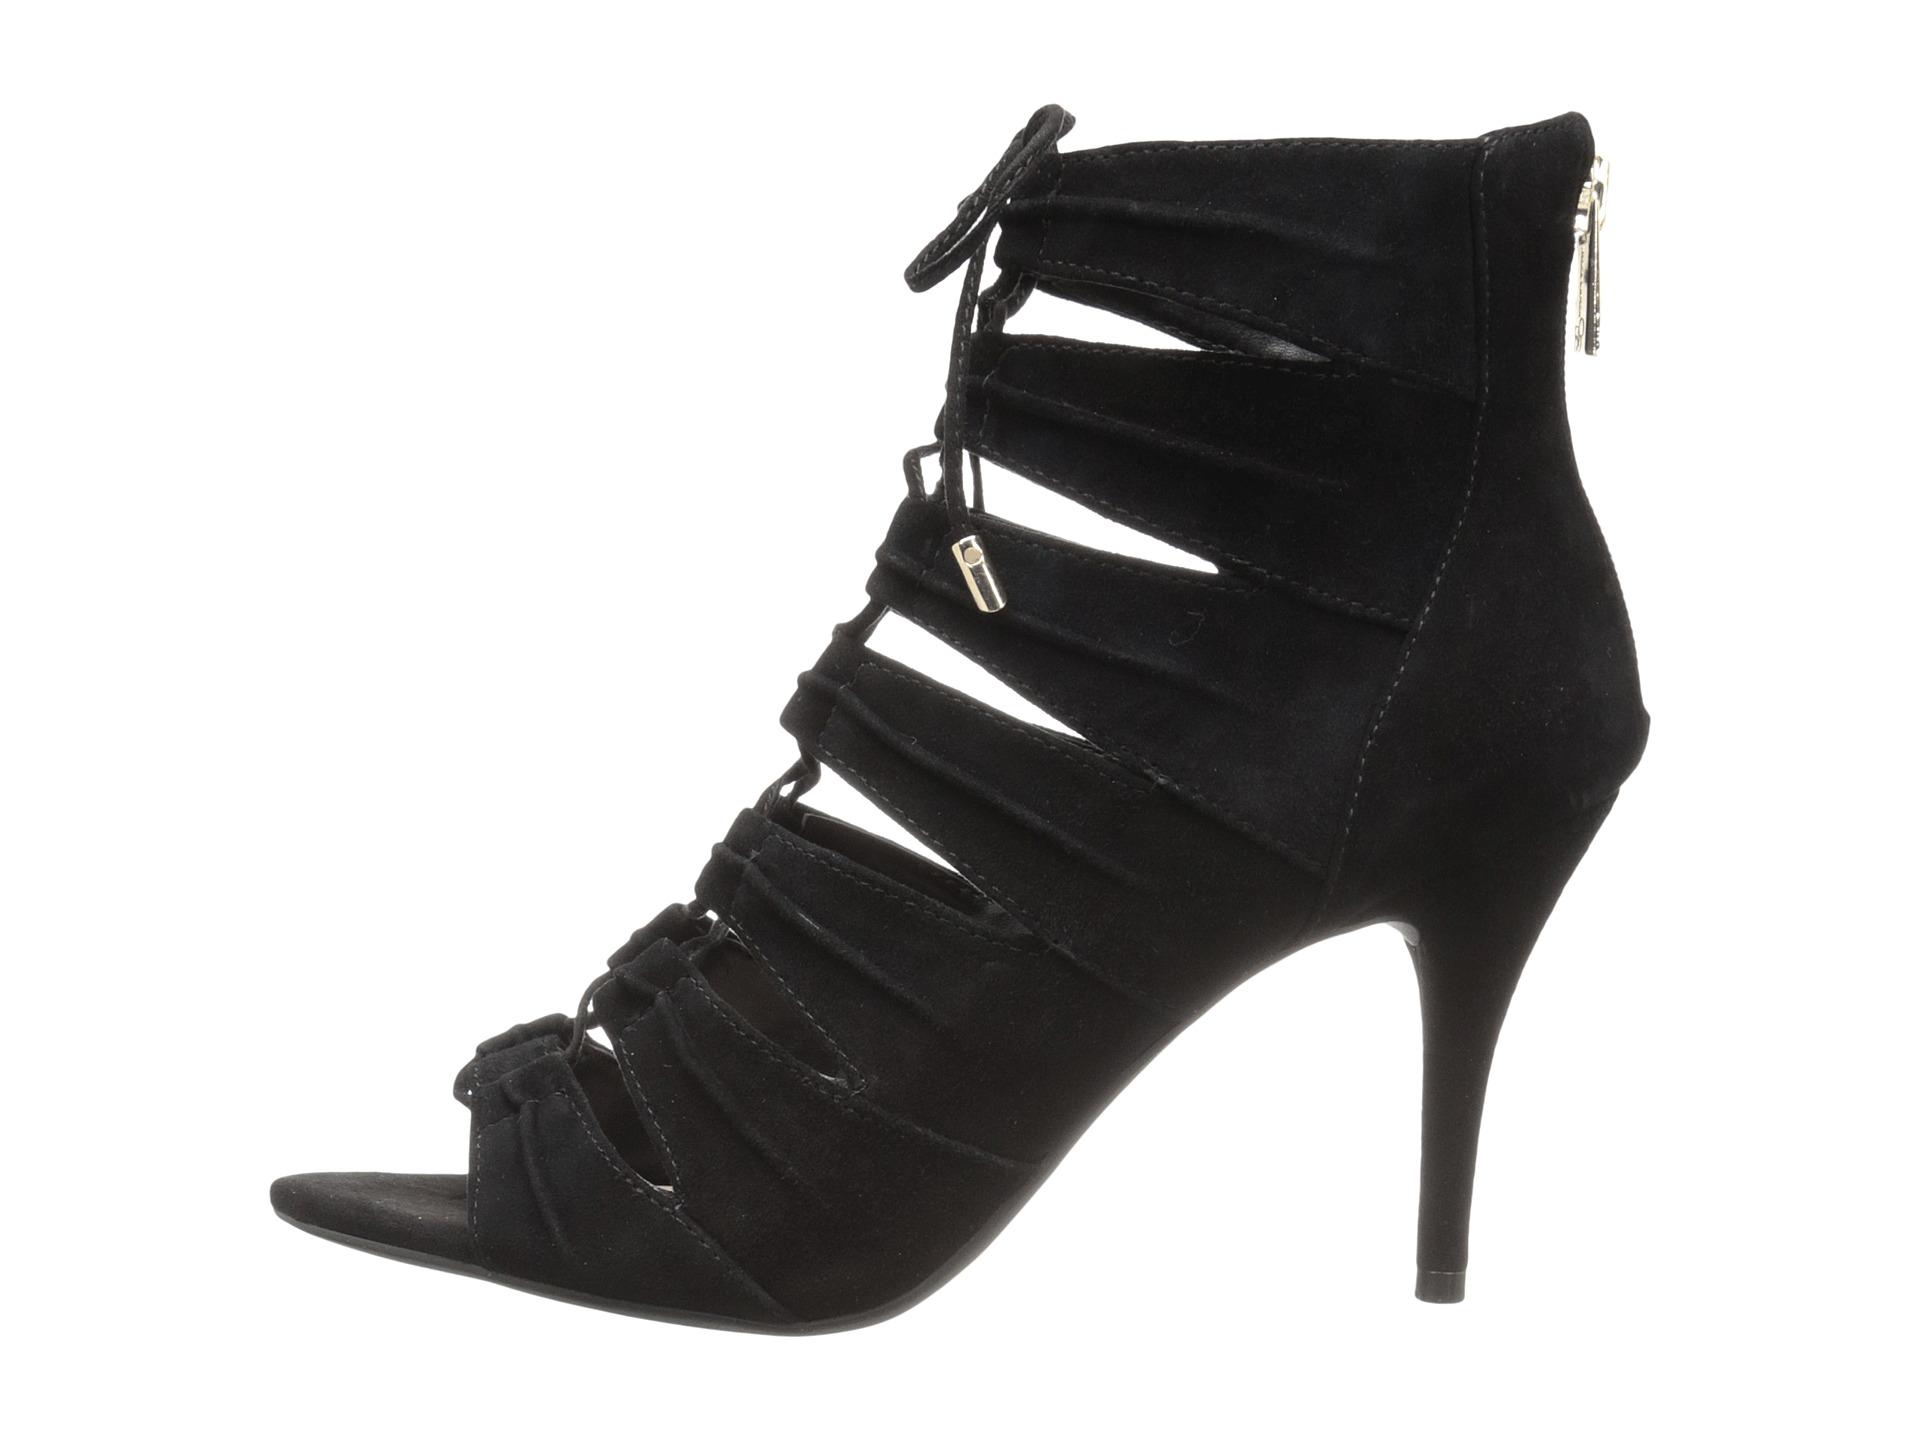 Jessica Simpson Womens MAHIRI Open Toe Classic Pumps Black Size 9.0 bqJD